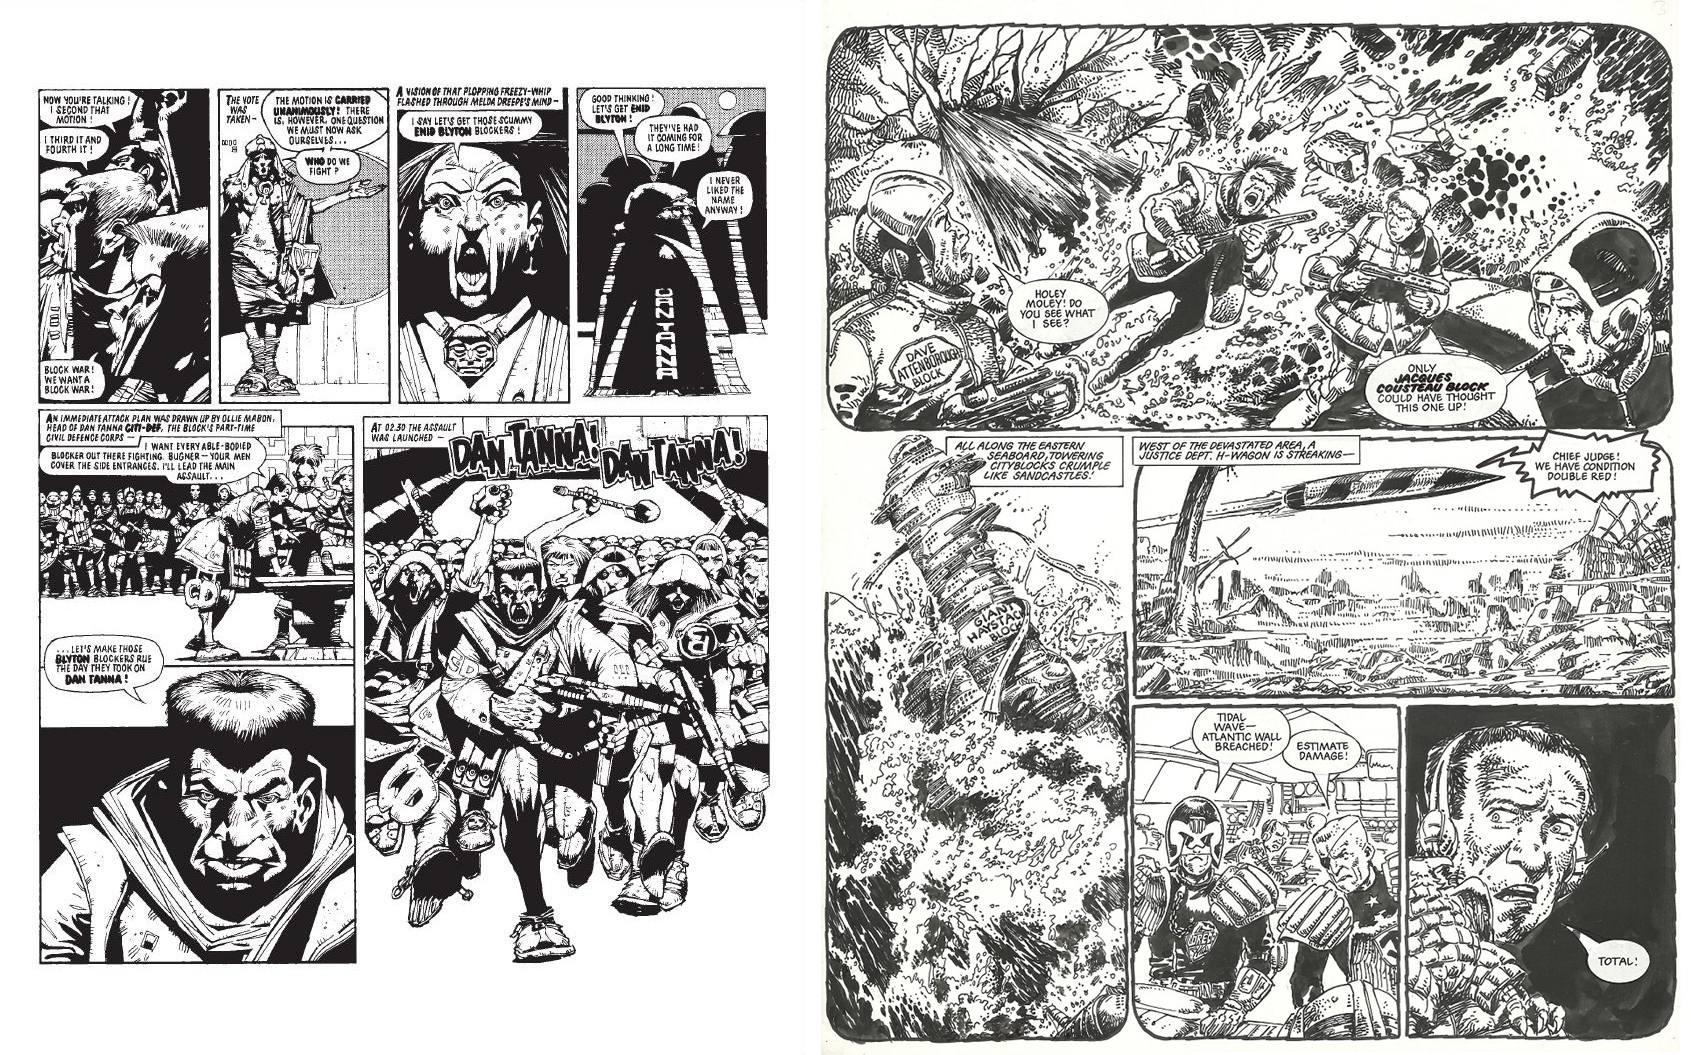 Judge Dredd Complete Case Files 05 review